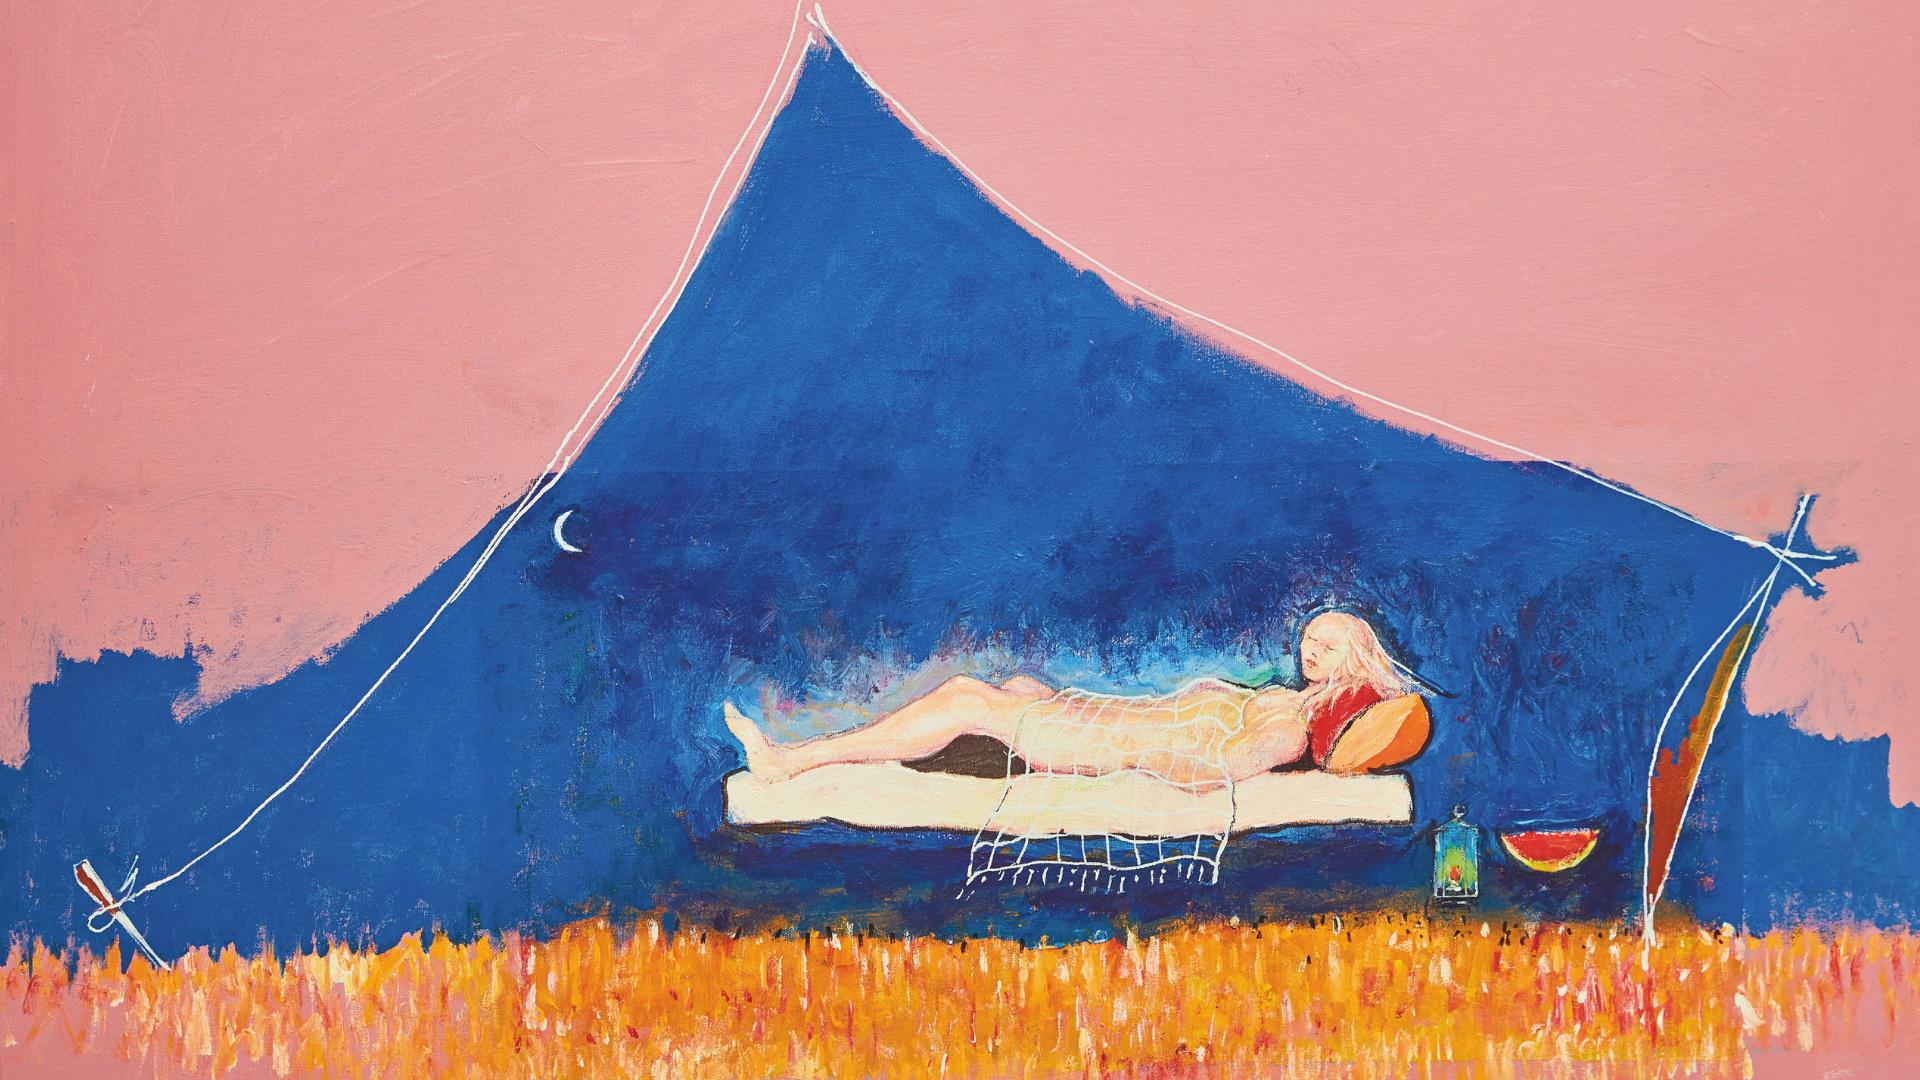 Architecture Of Being: Iraqi-British Artist Heitham Adjina Debuts First Solo Exhibition In Dubai